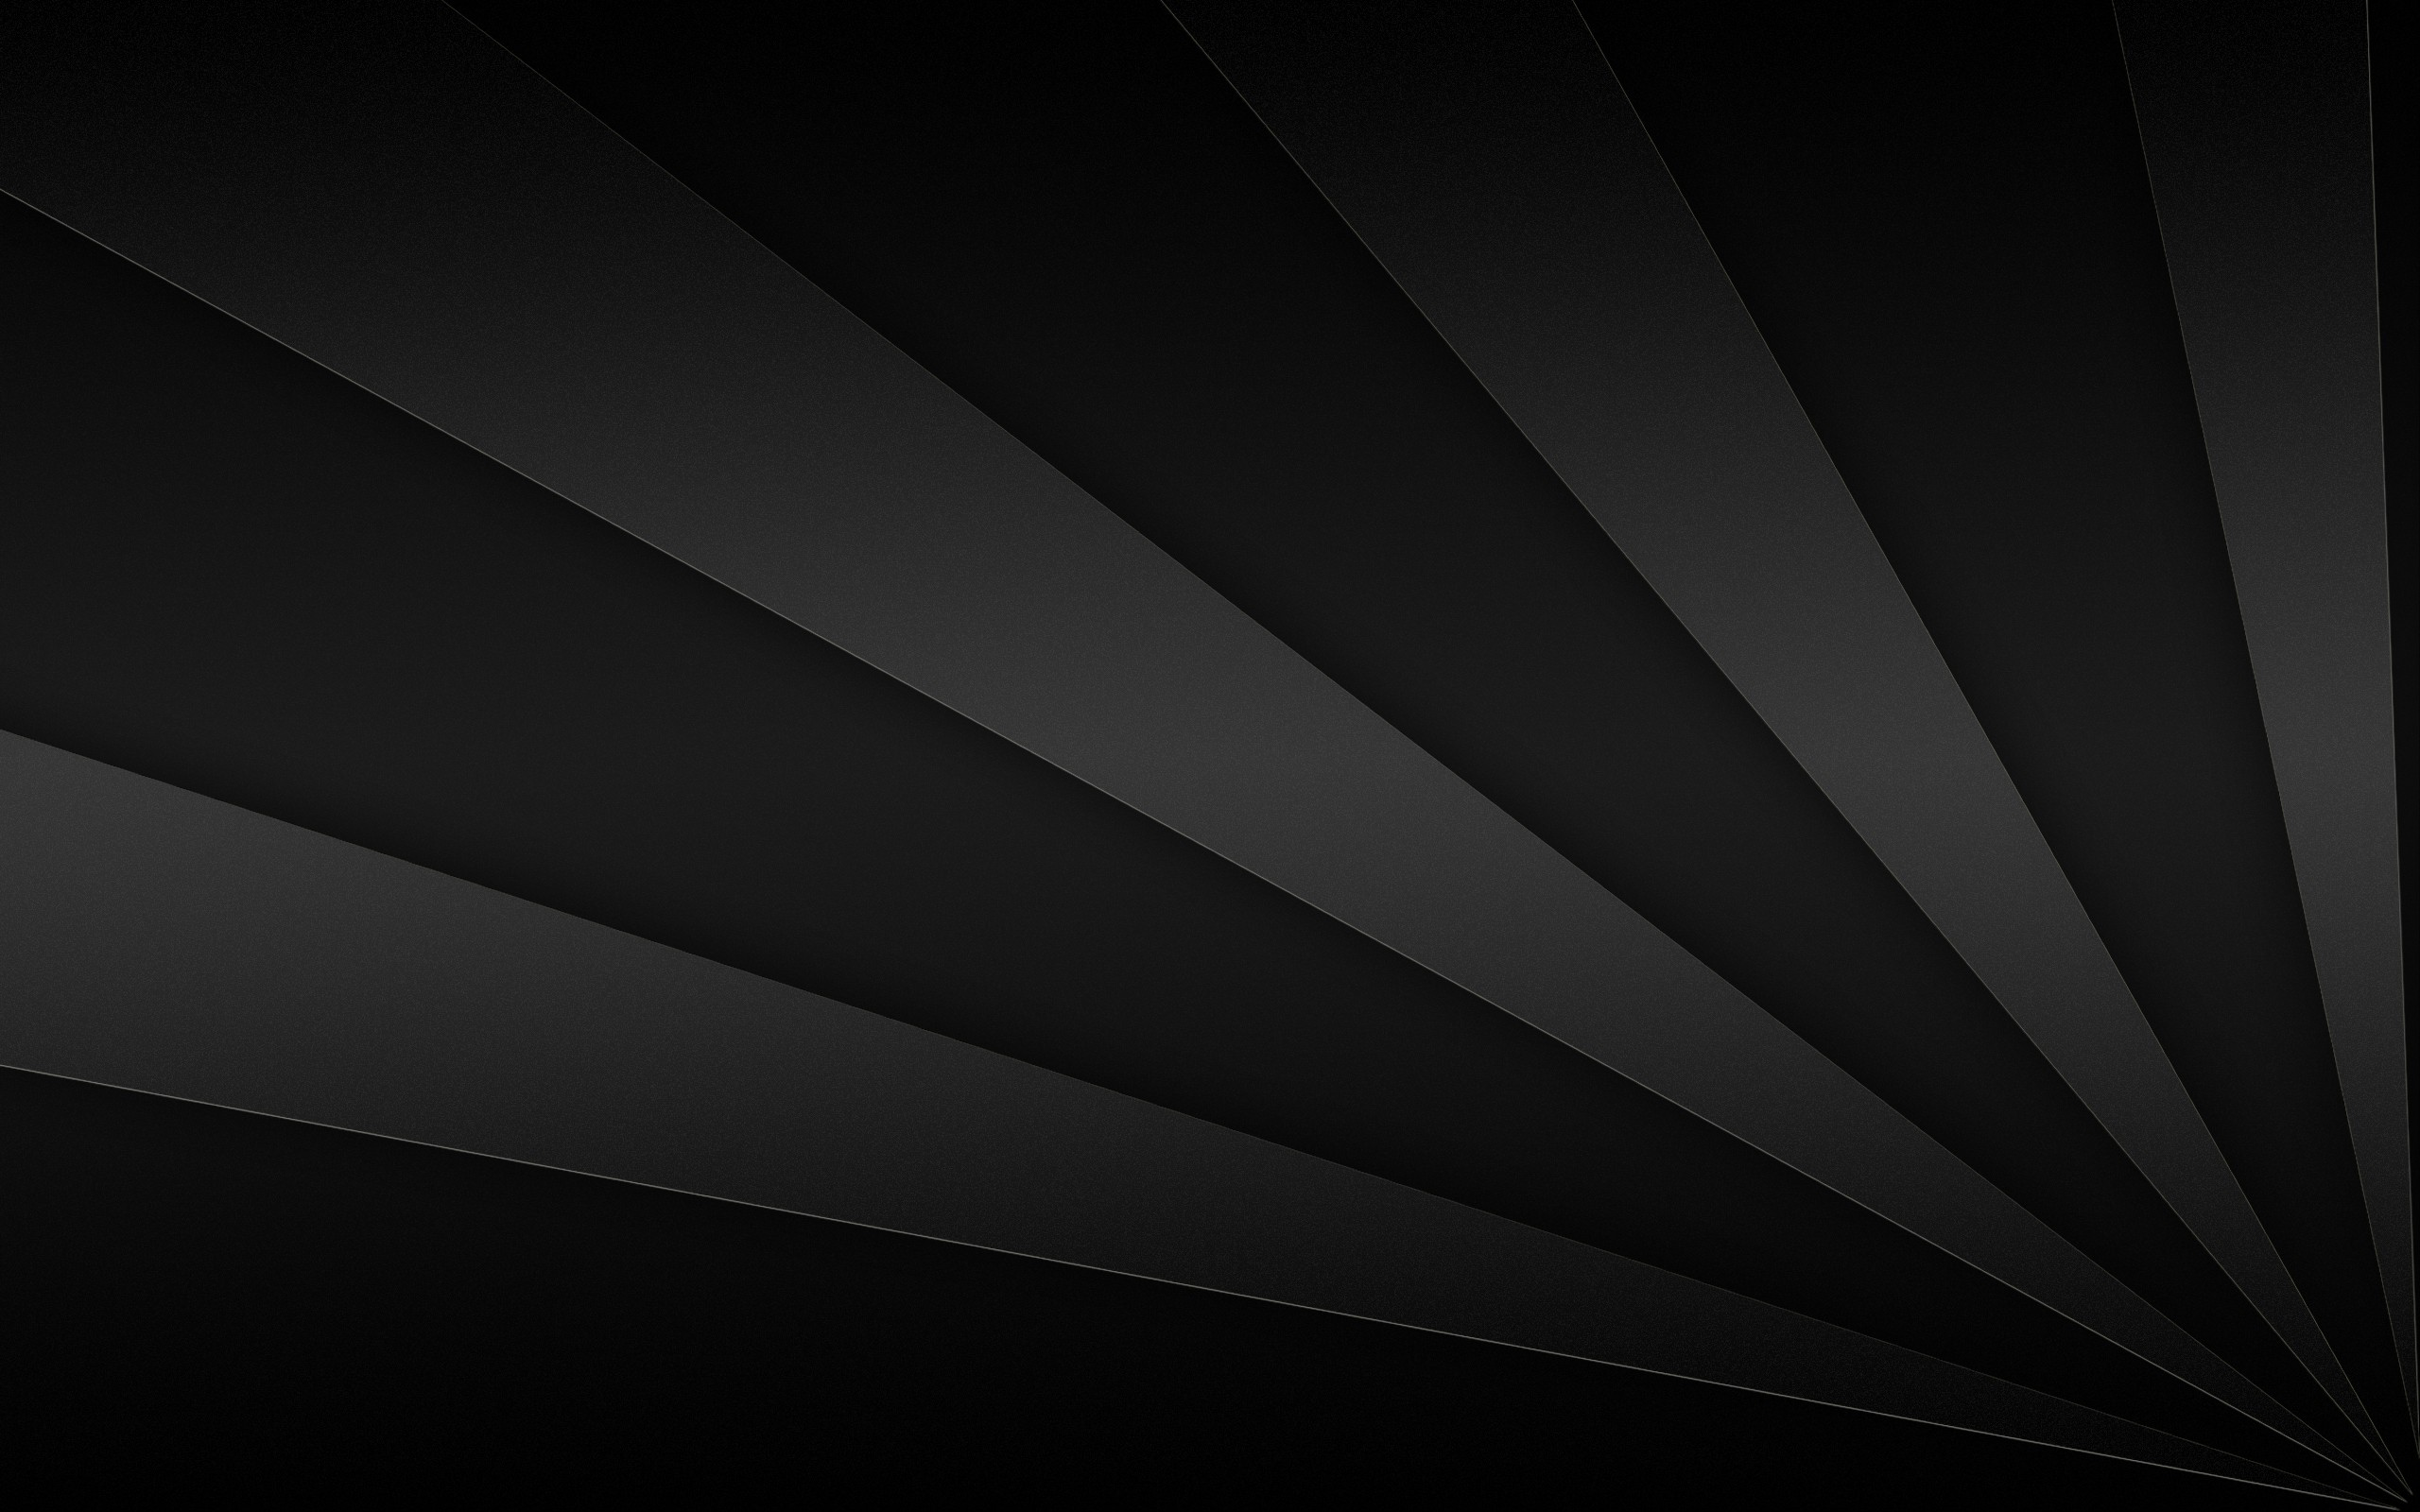 Website background ·① Download free stunning backgrounds ...